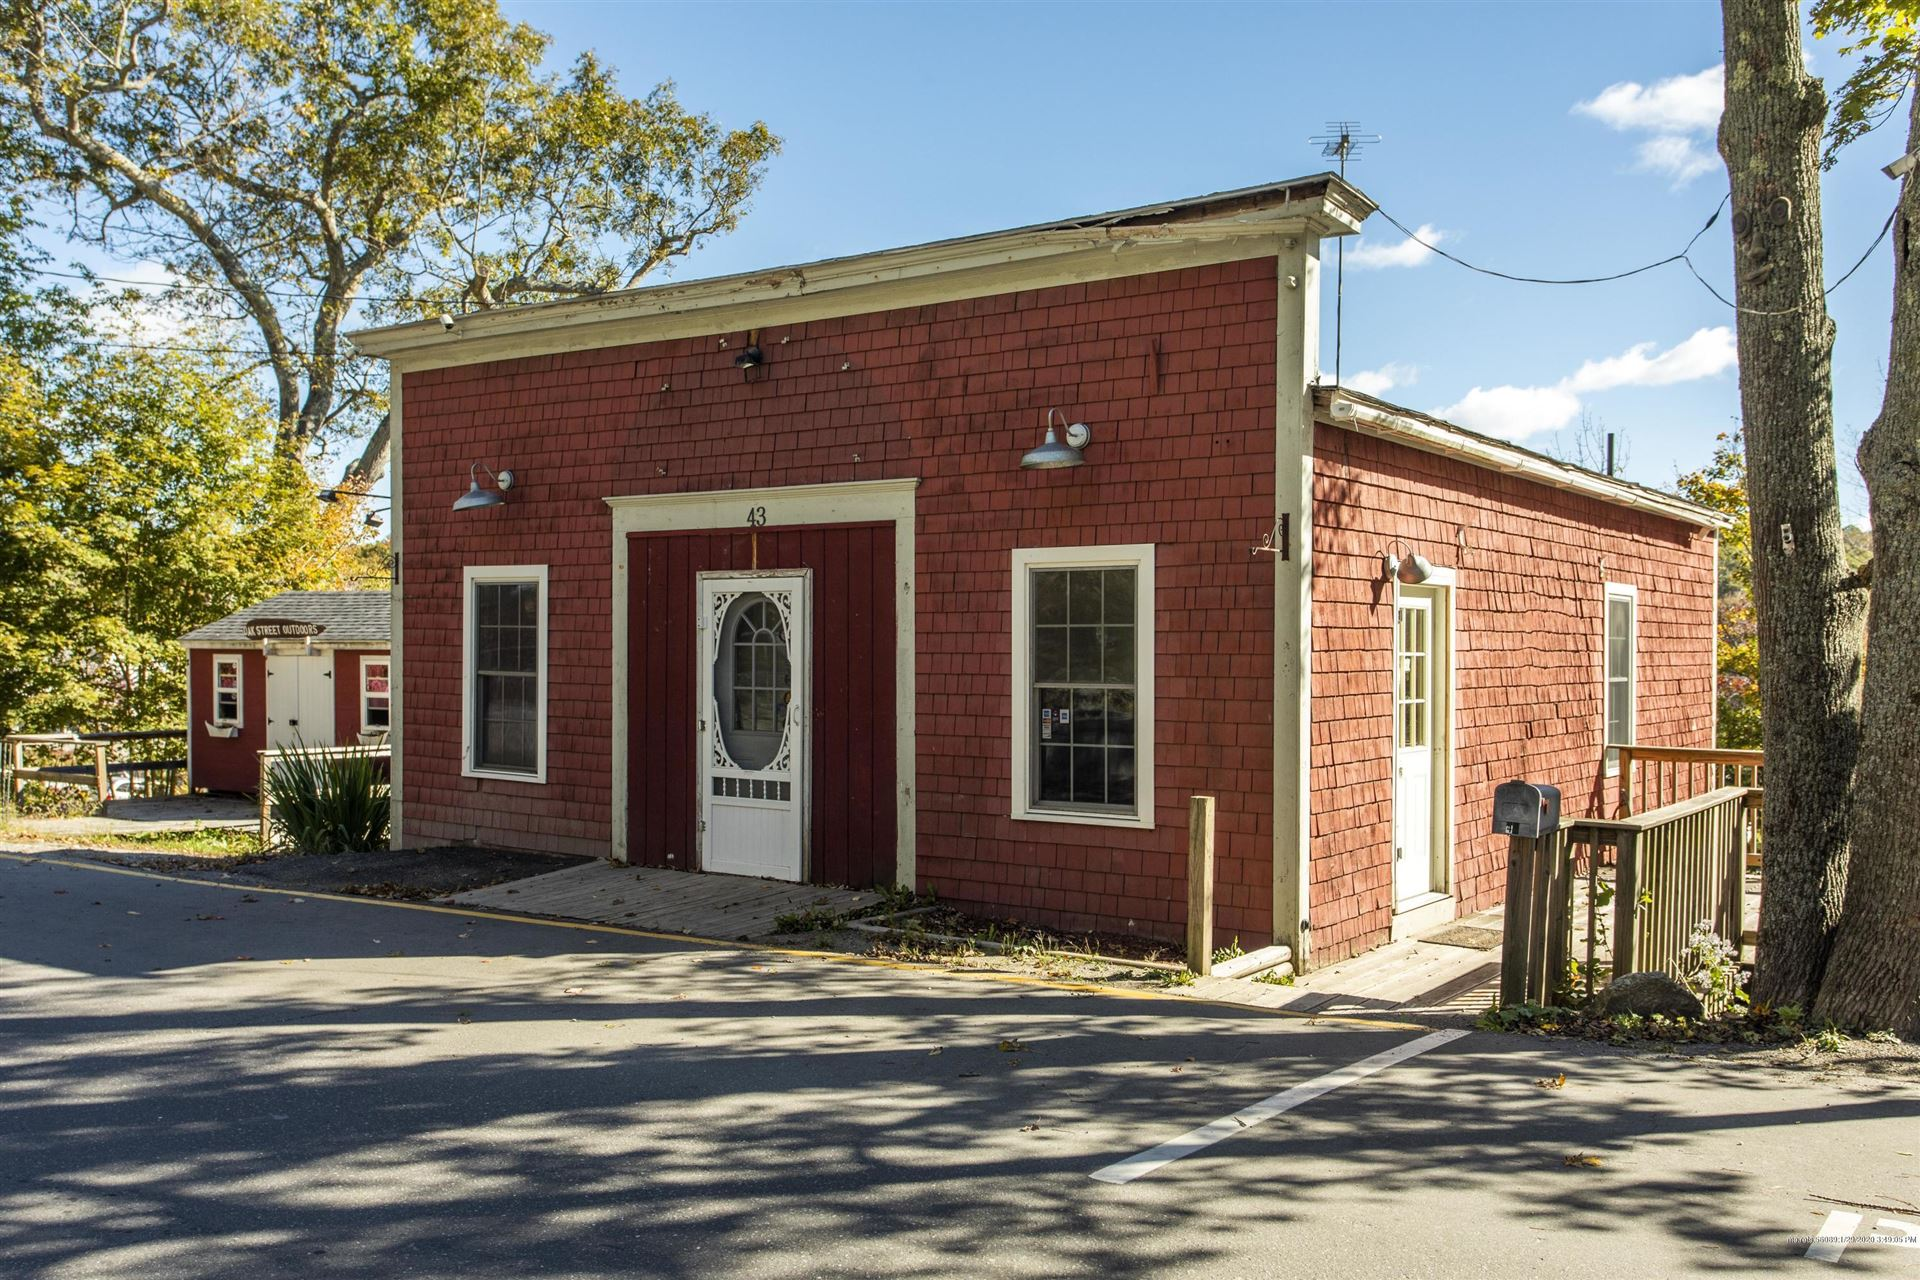 Photo of 43 Oak Street, Boothbay Harbor, ME 04538 (MLS # 1443319)